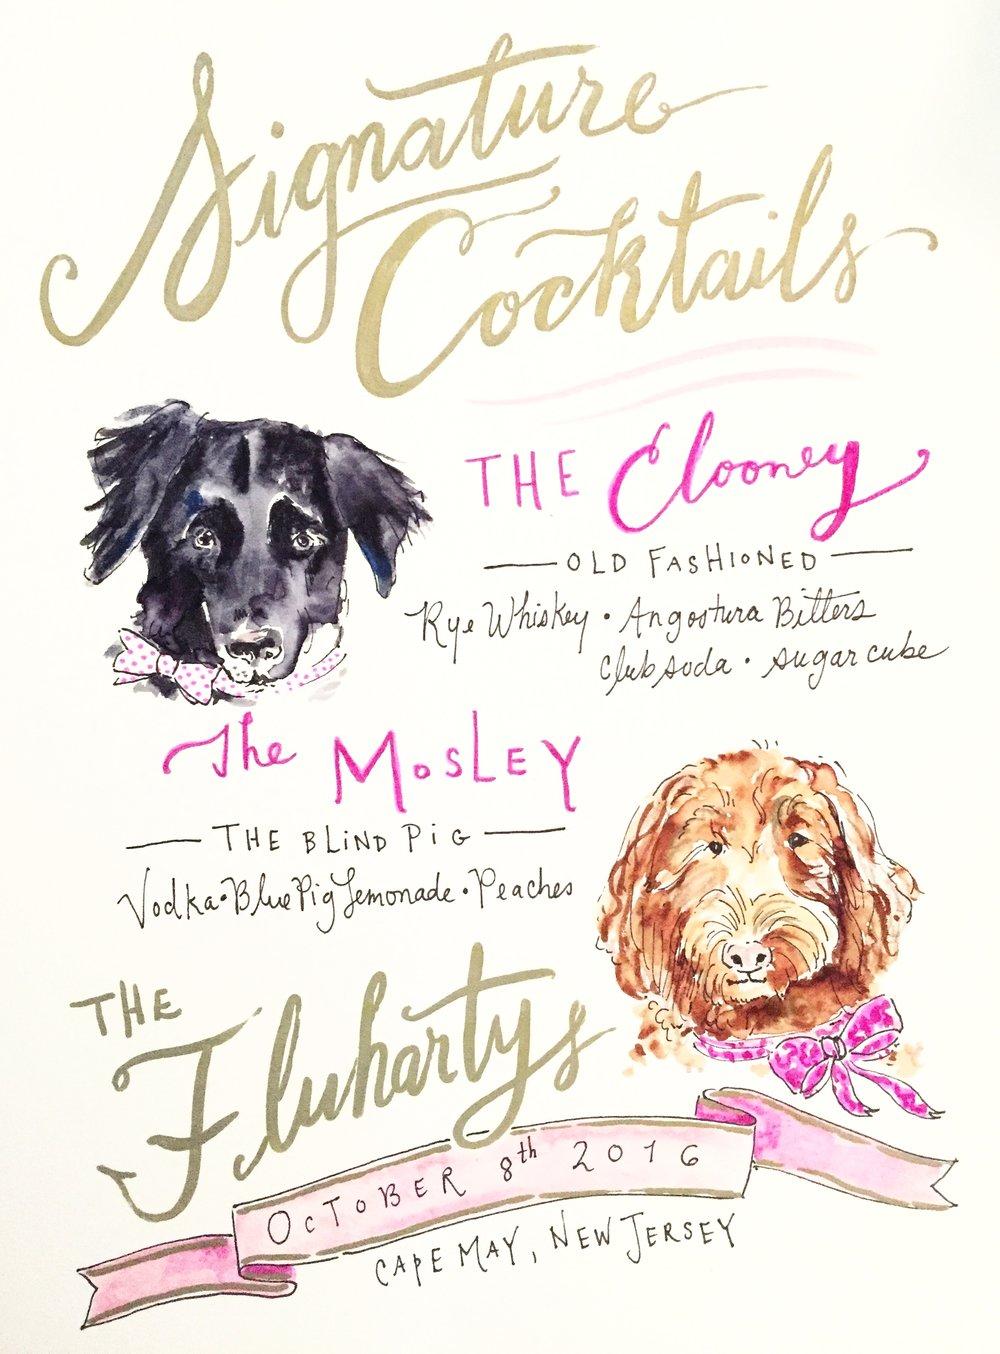 The Fluharty's Signature Cocktail Menu